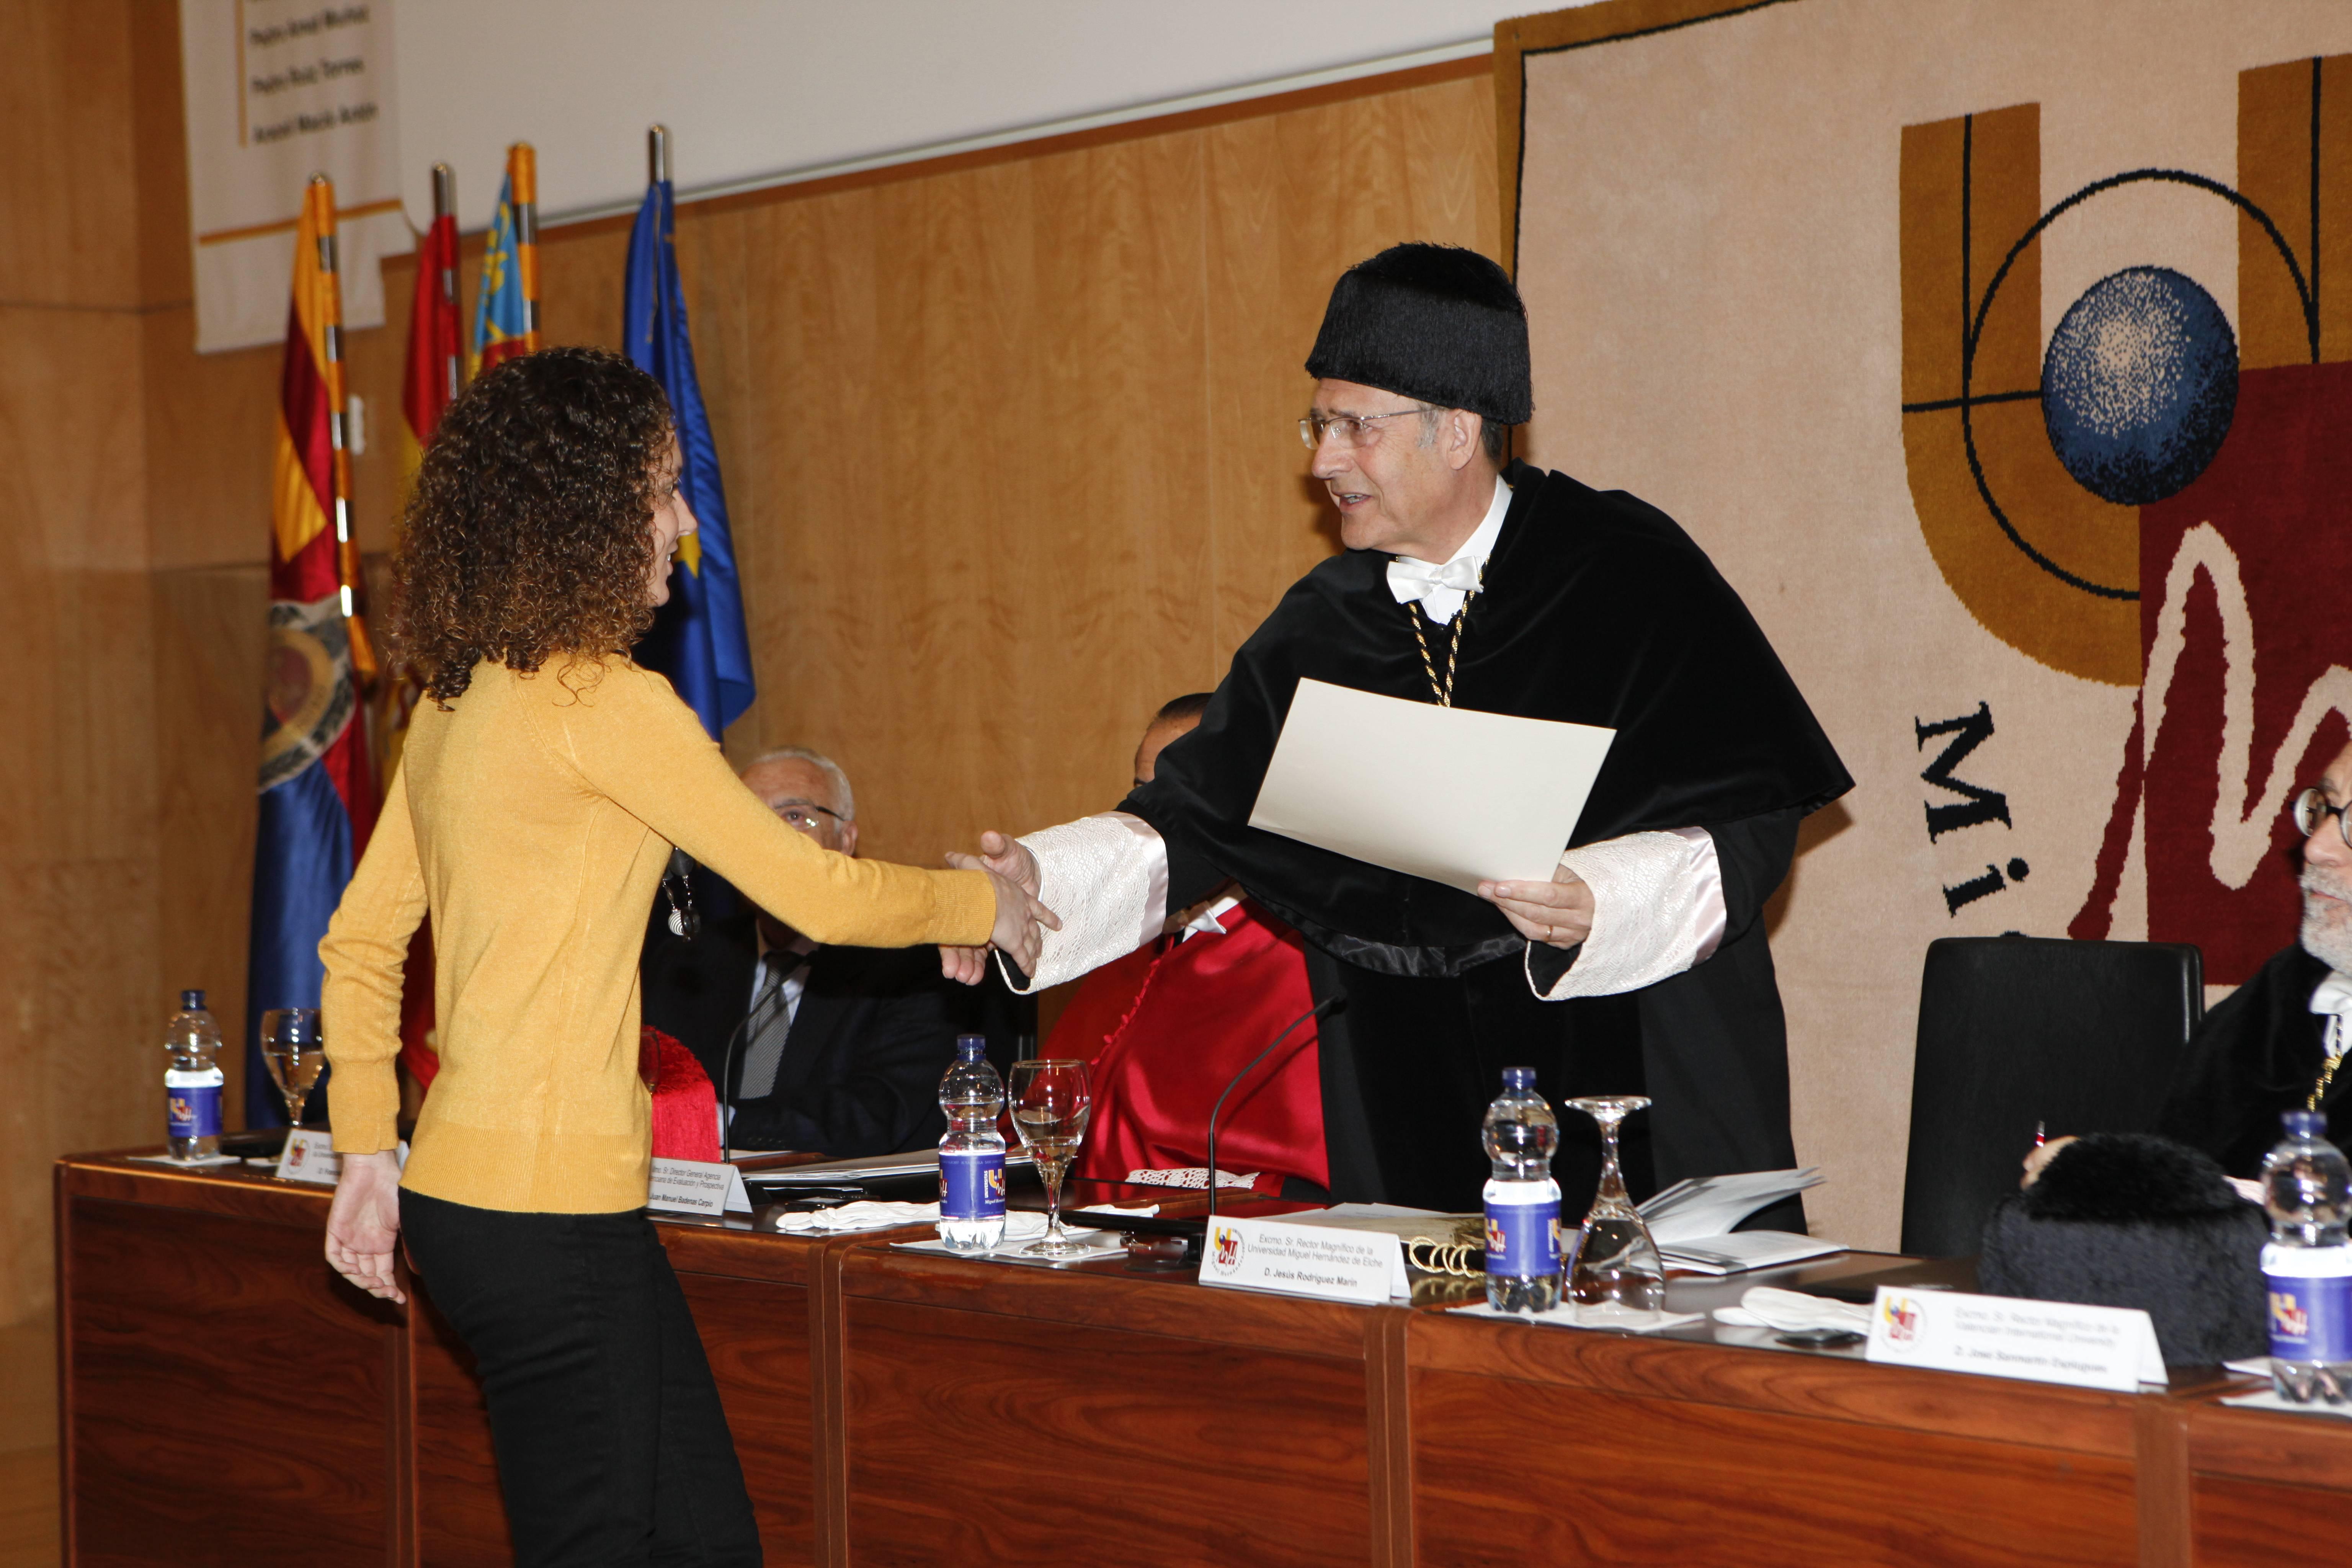 doctor-honoris-causa-luis-gamir_mg_0950.jpg